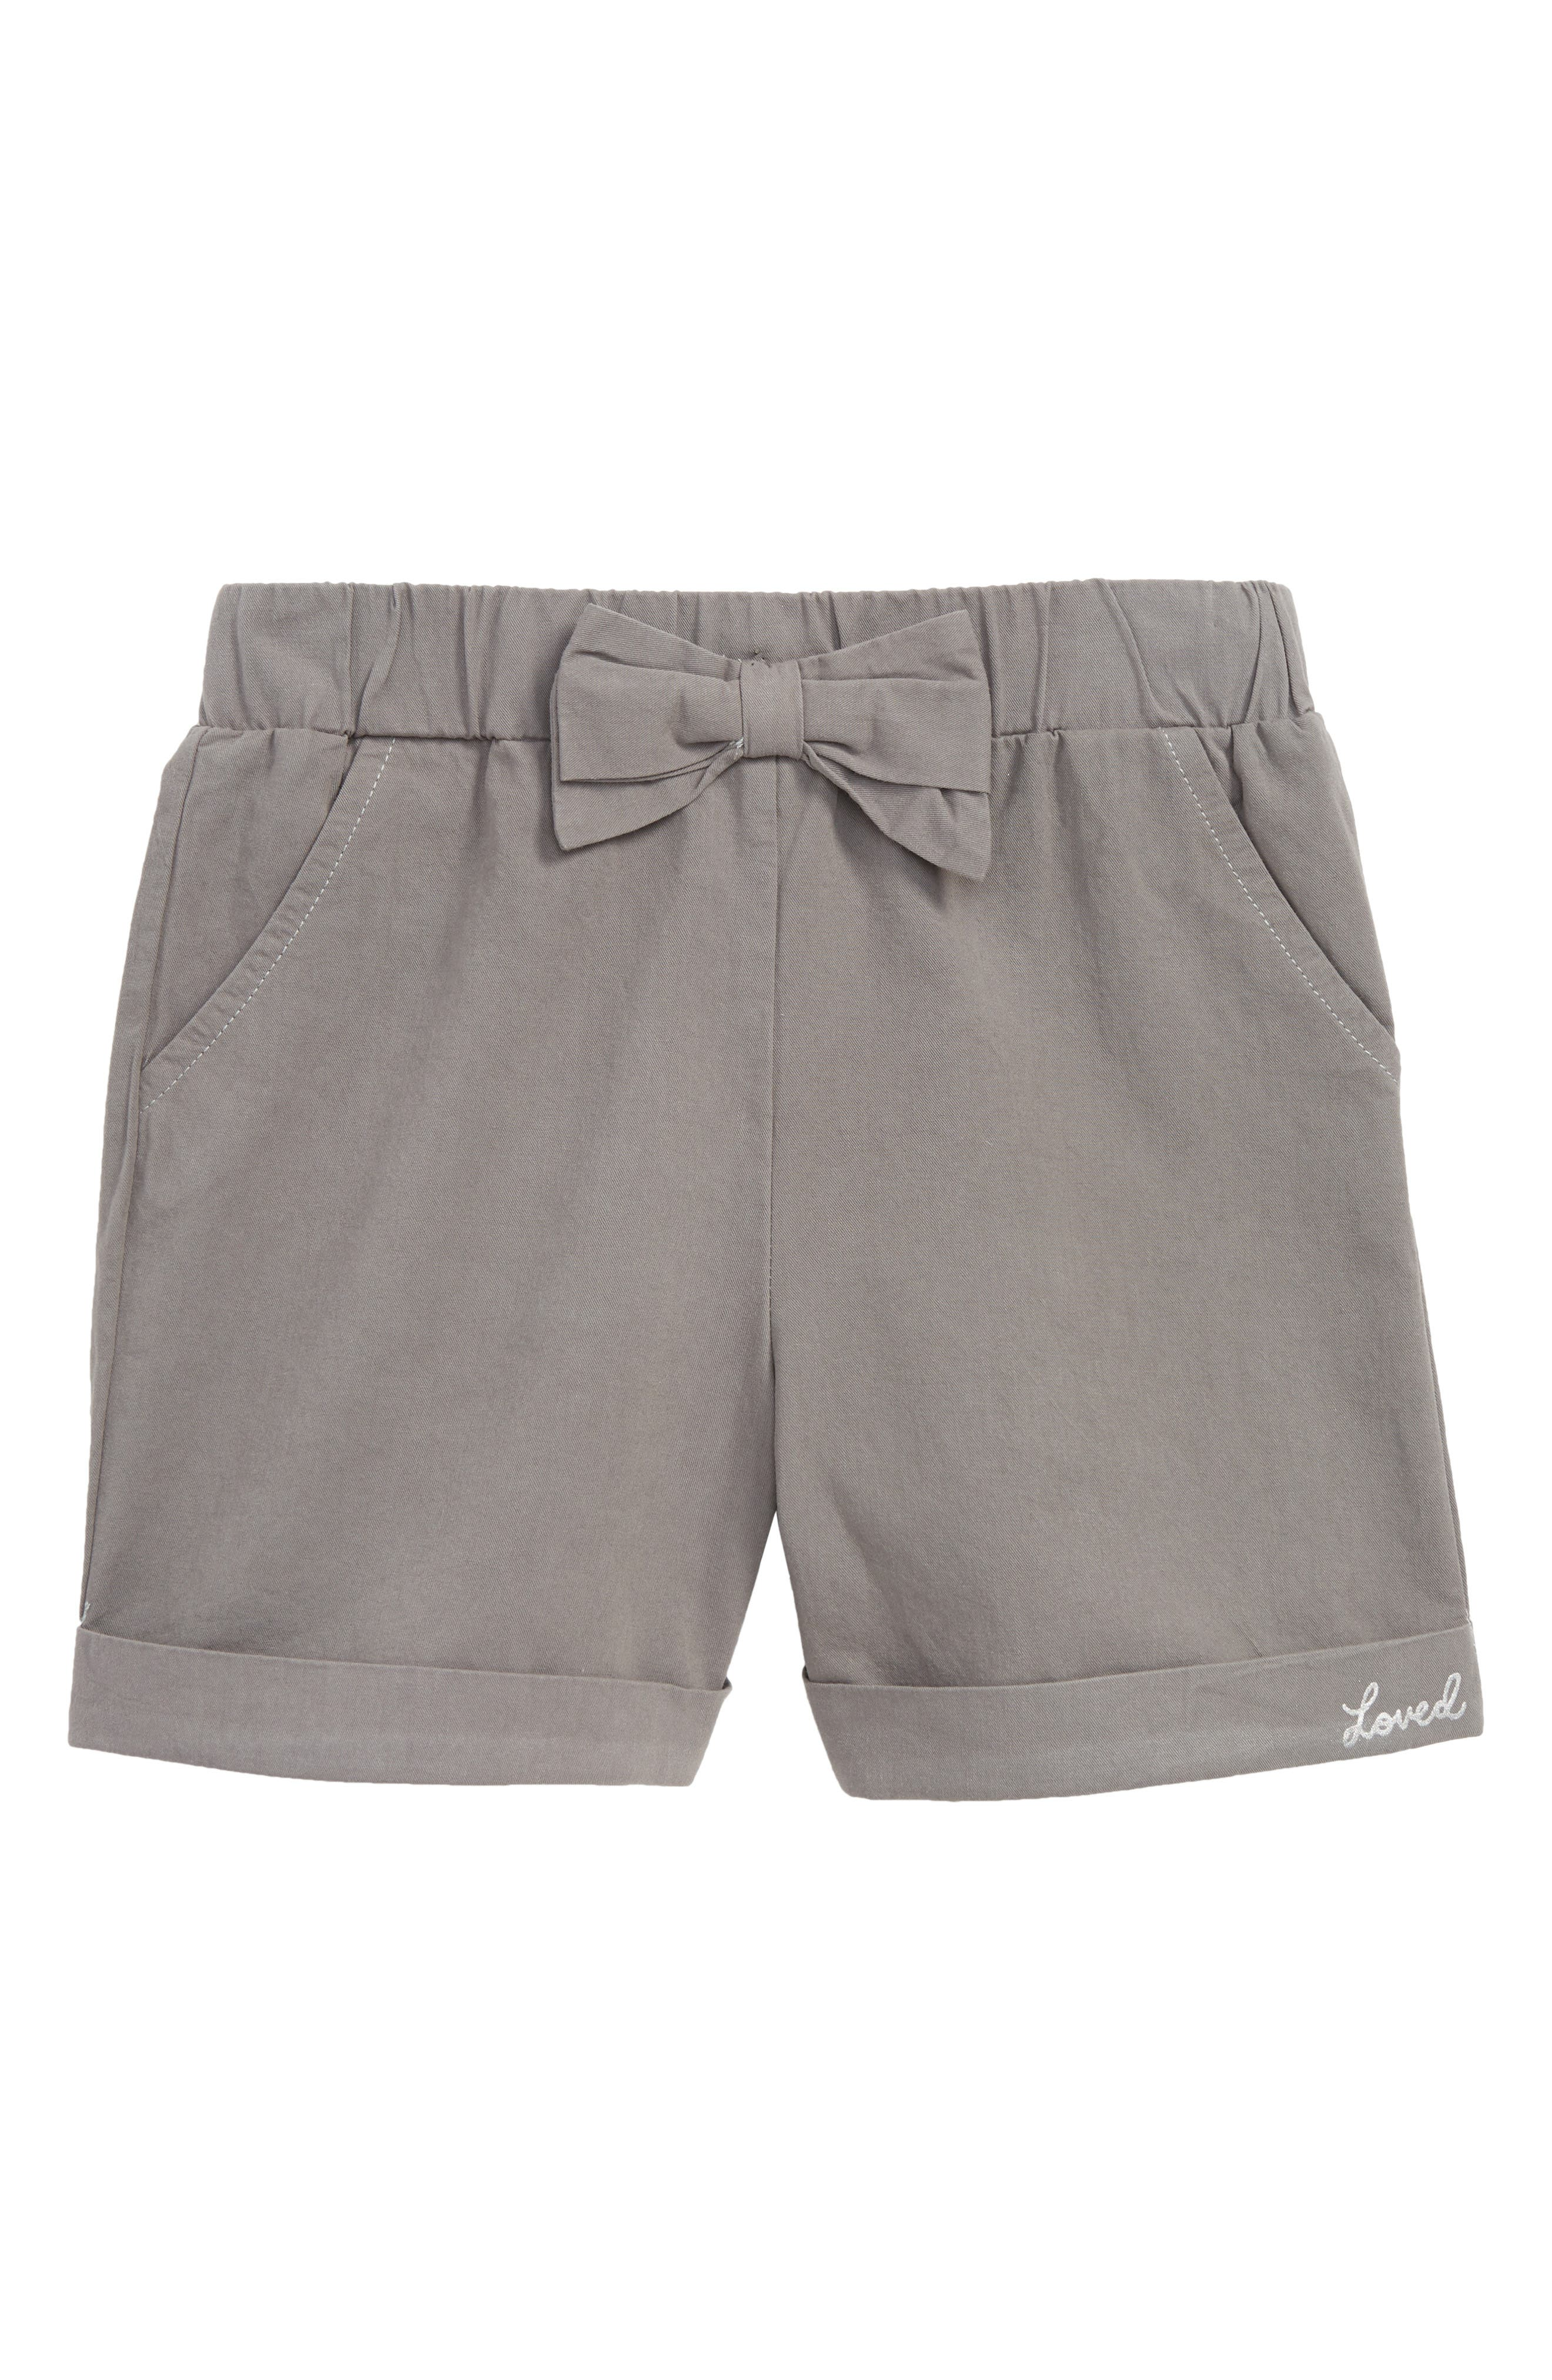 Cuffed Shorts,                             Main thumbnail 1, color,                             Charcoal